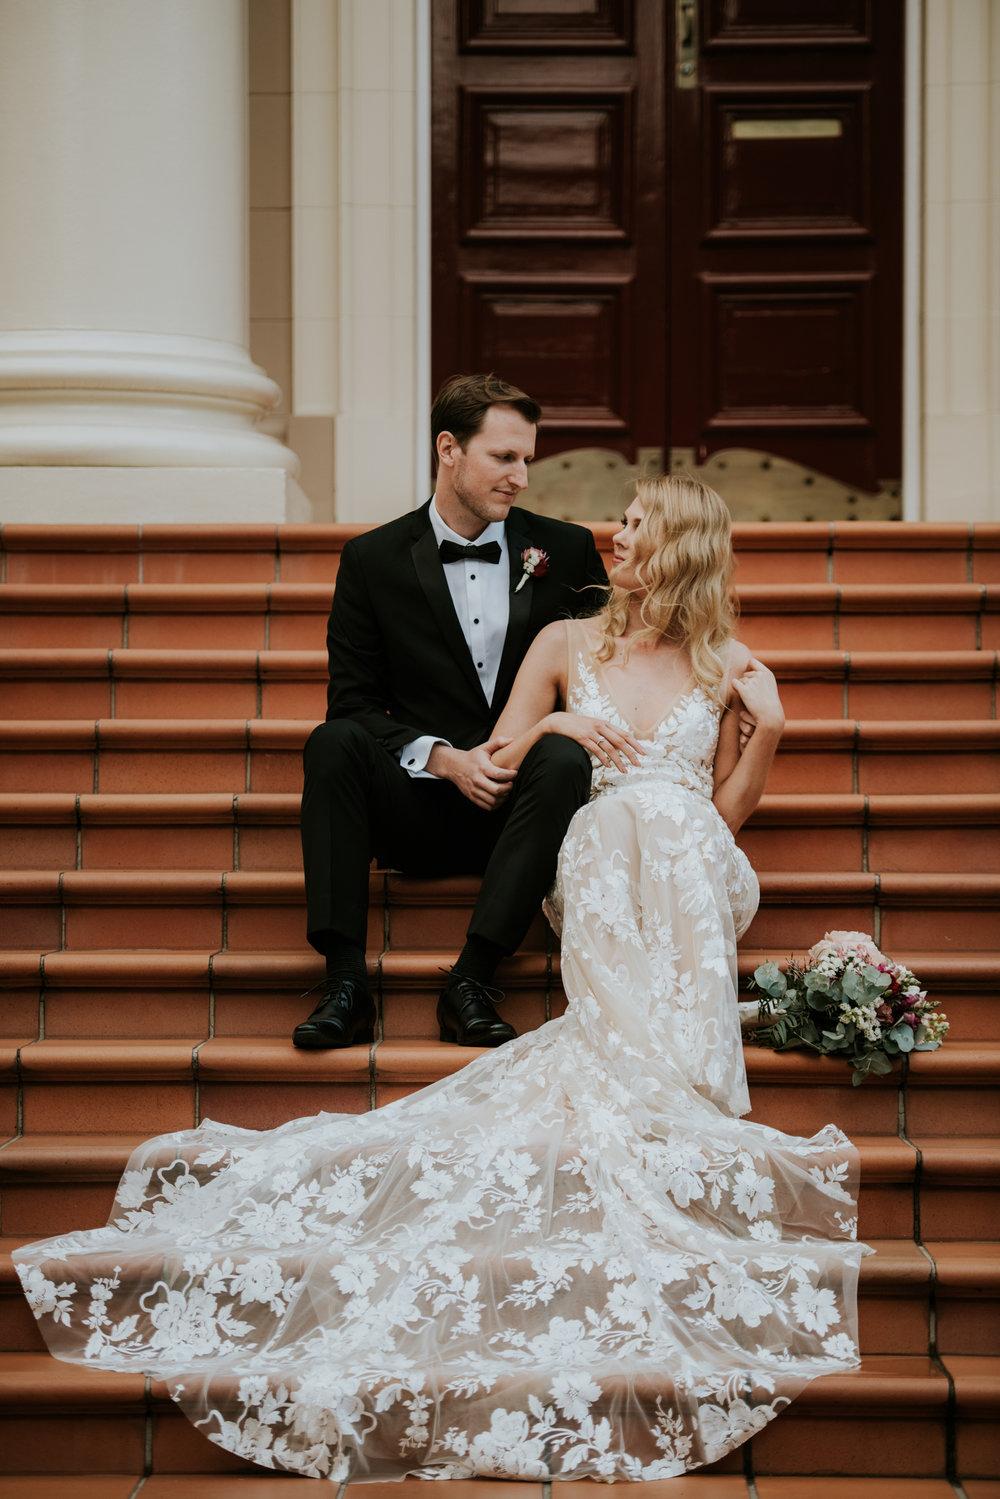 Brisbane Wedding Photographer | Engagement-Elopement Photography | Factory51-City Botantic Gardens Wedding-64.jpg